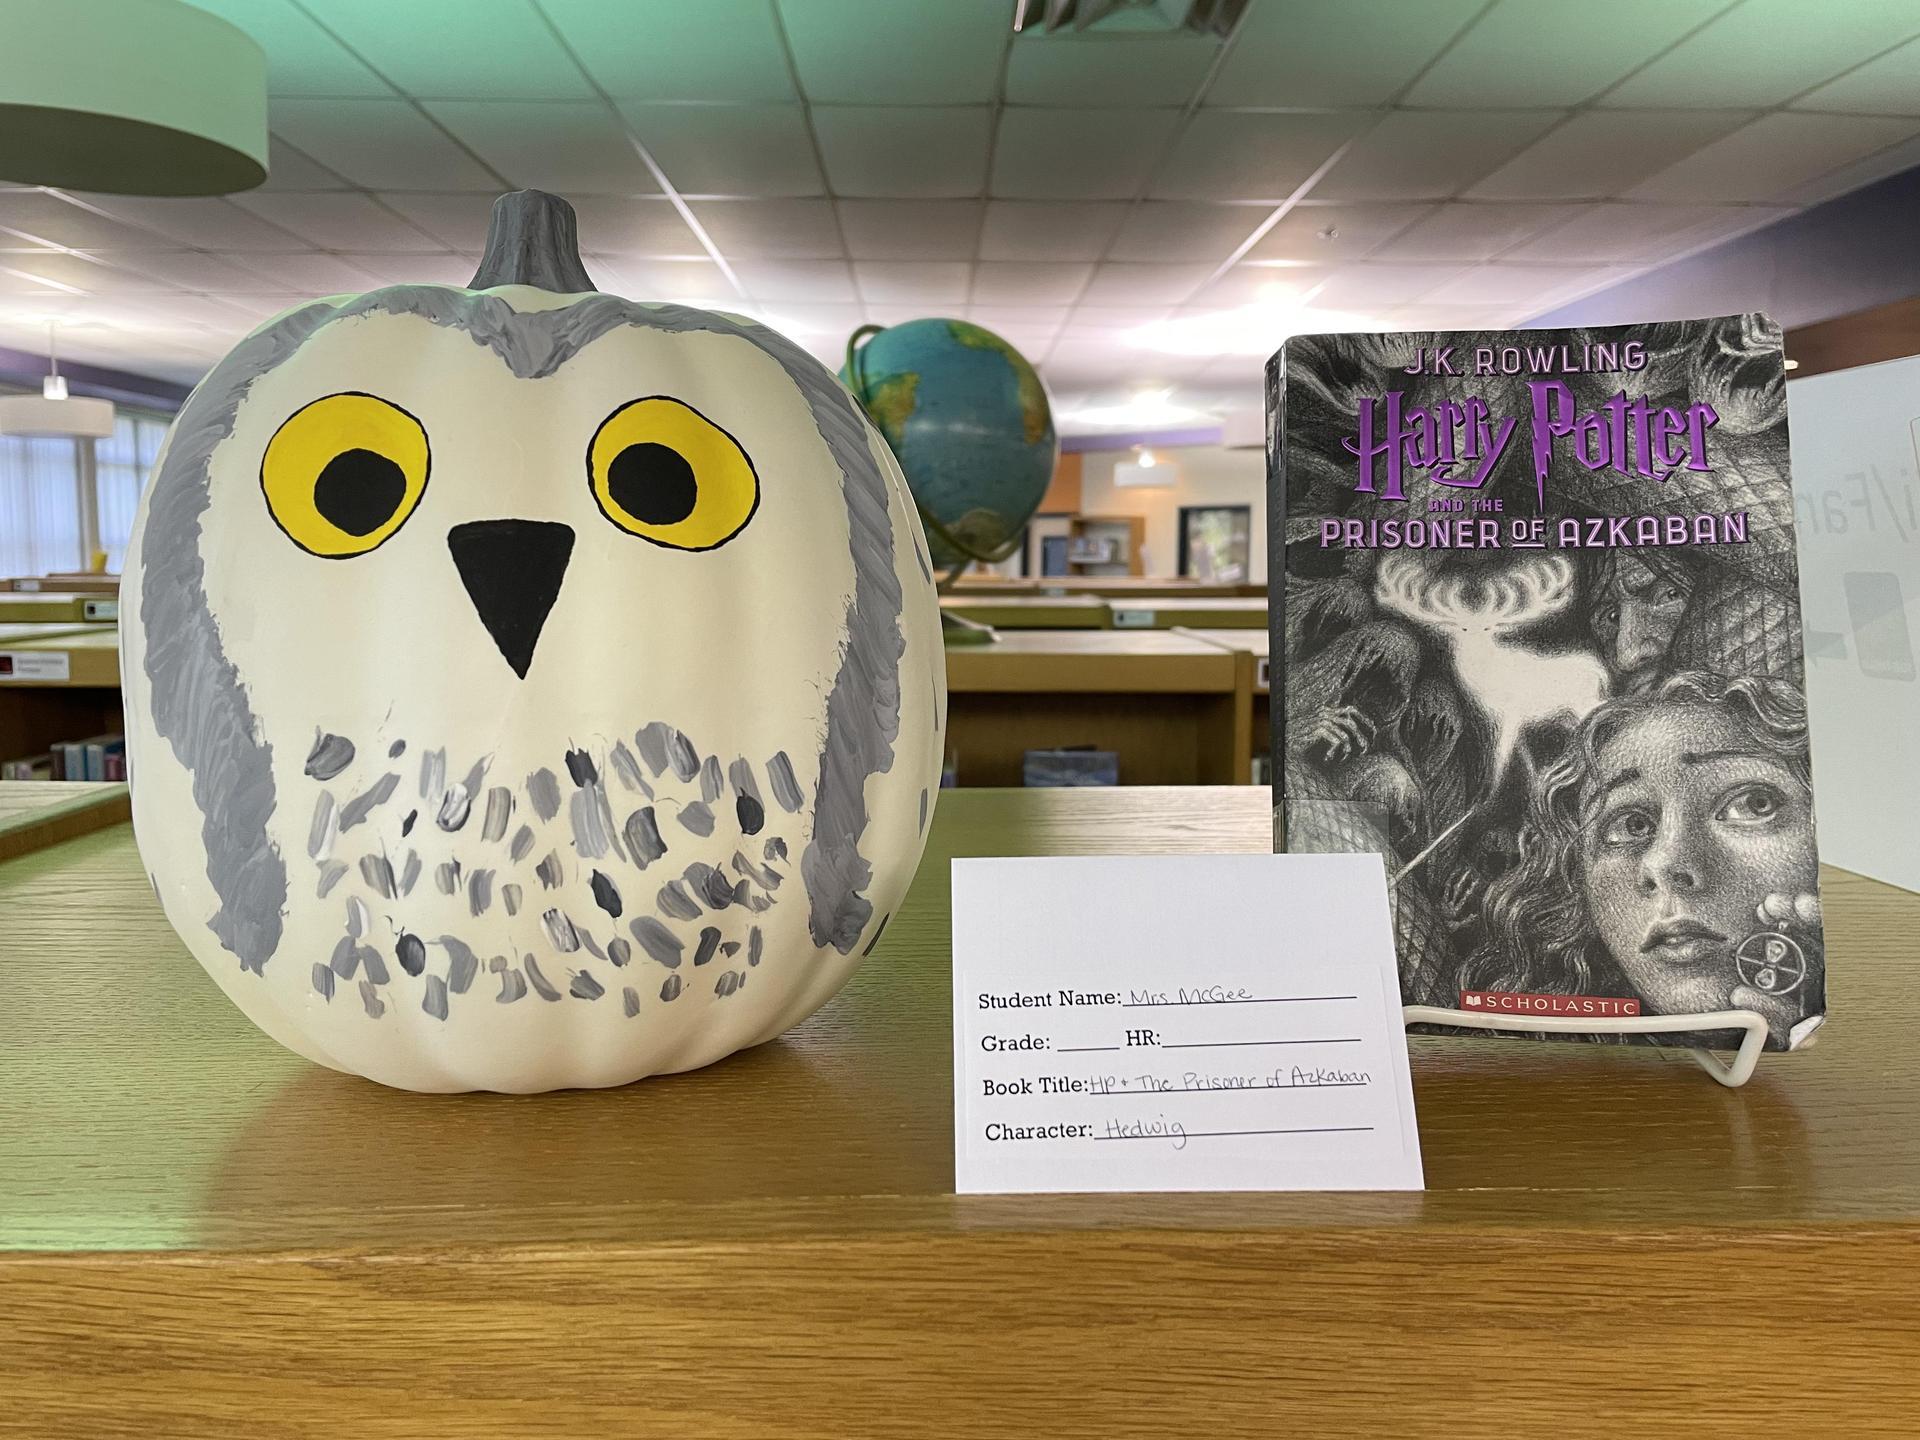 Book Character Pumpkin: Hedwig